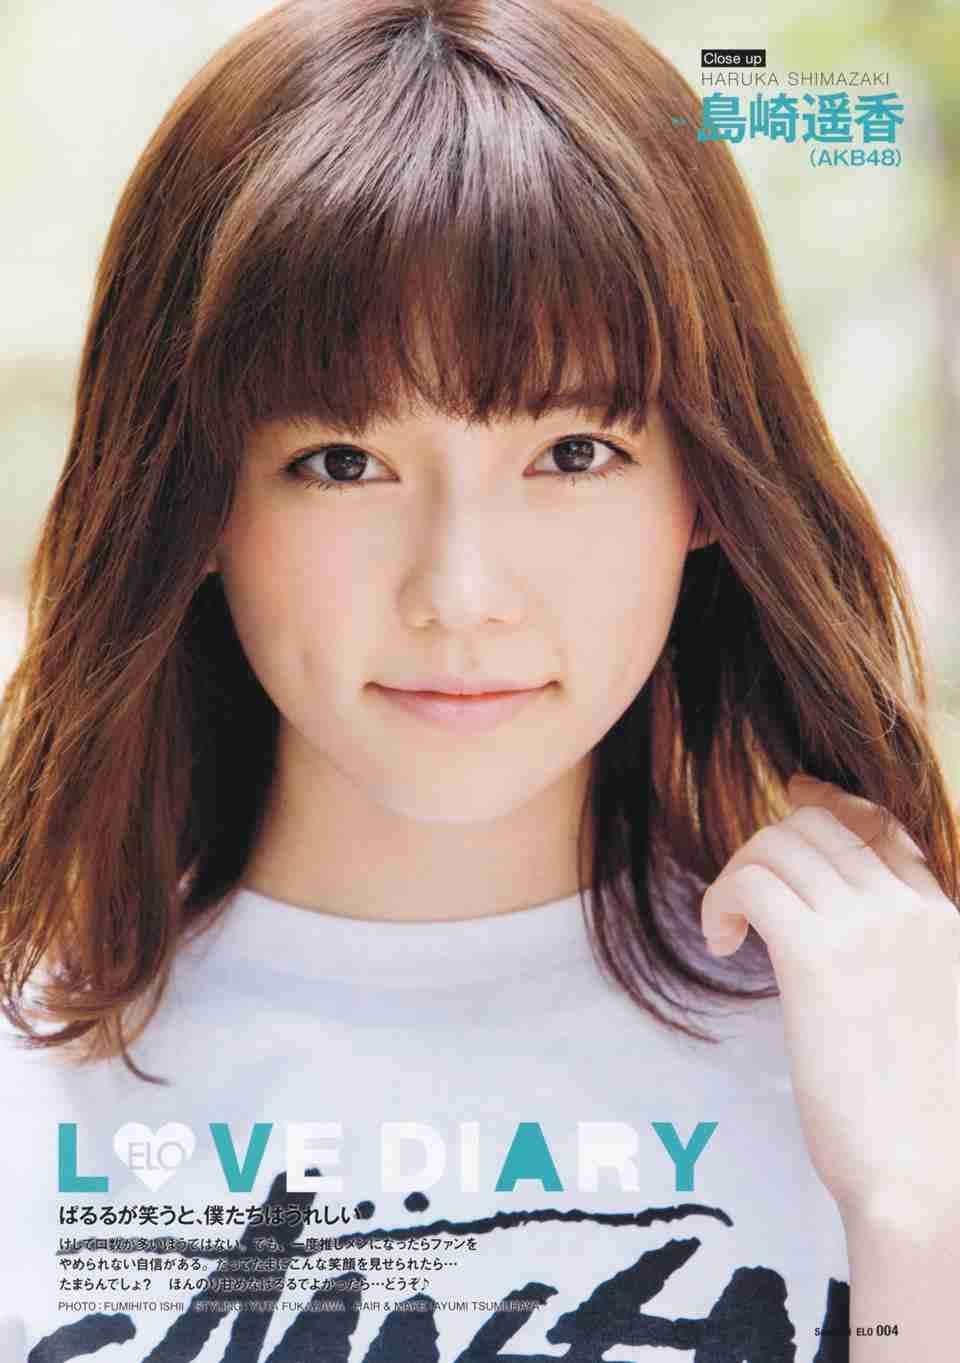 AKB48ぱるること島崎遥香が公式InstagramでSexyZoneの写真をプライベート垢と間違えて誤爆し即効削除